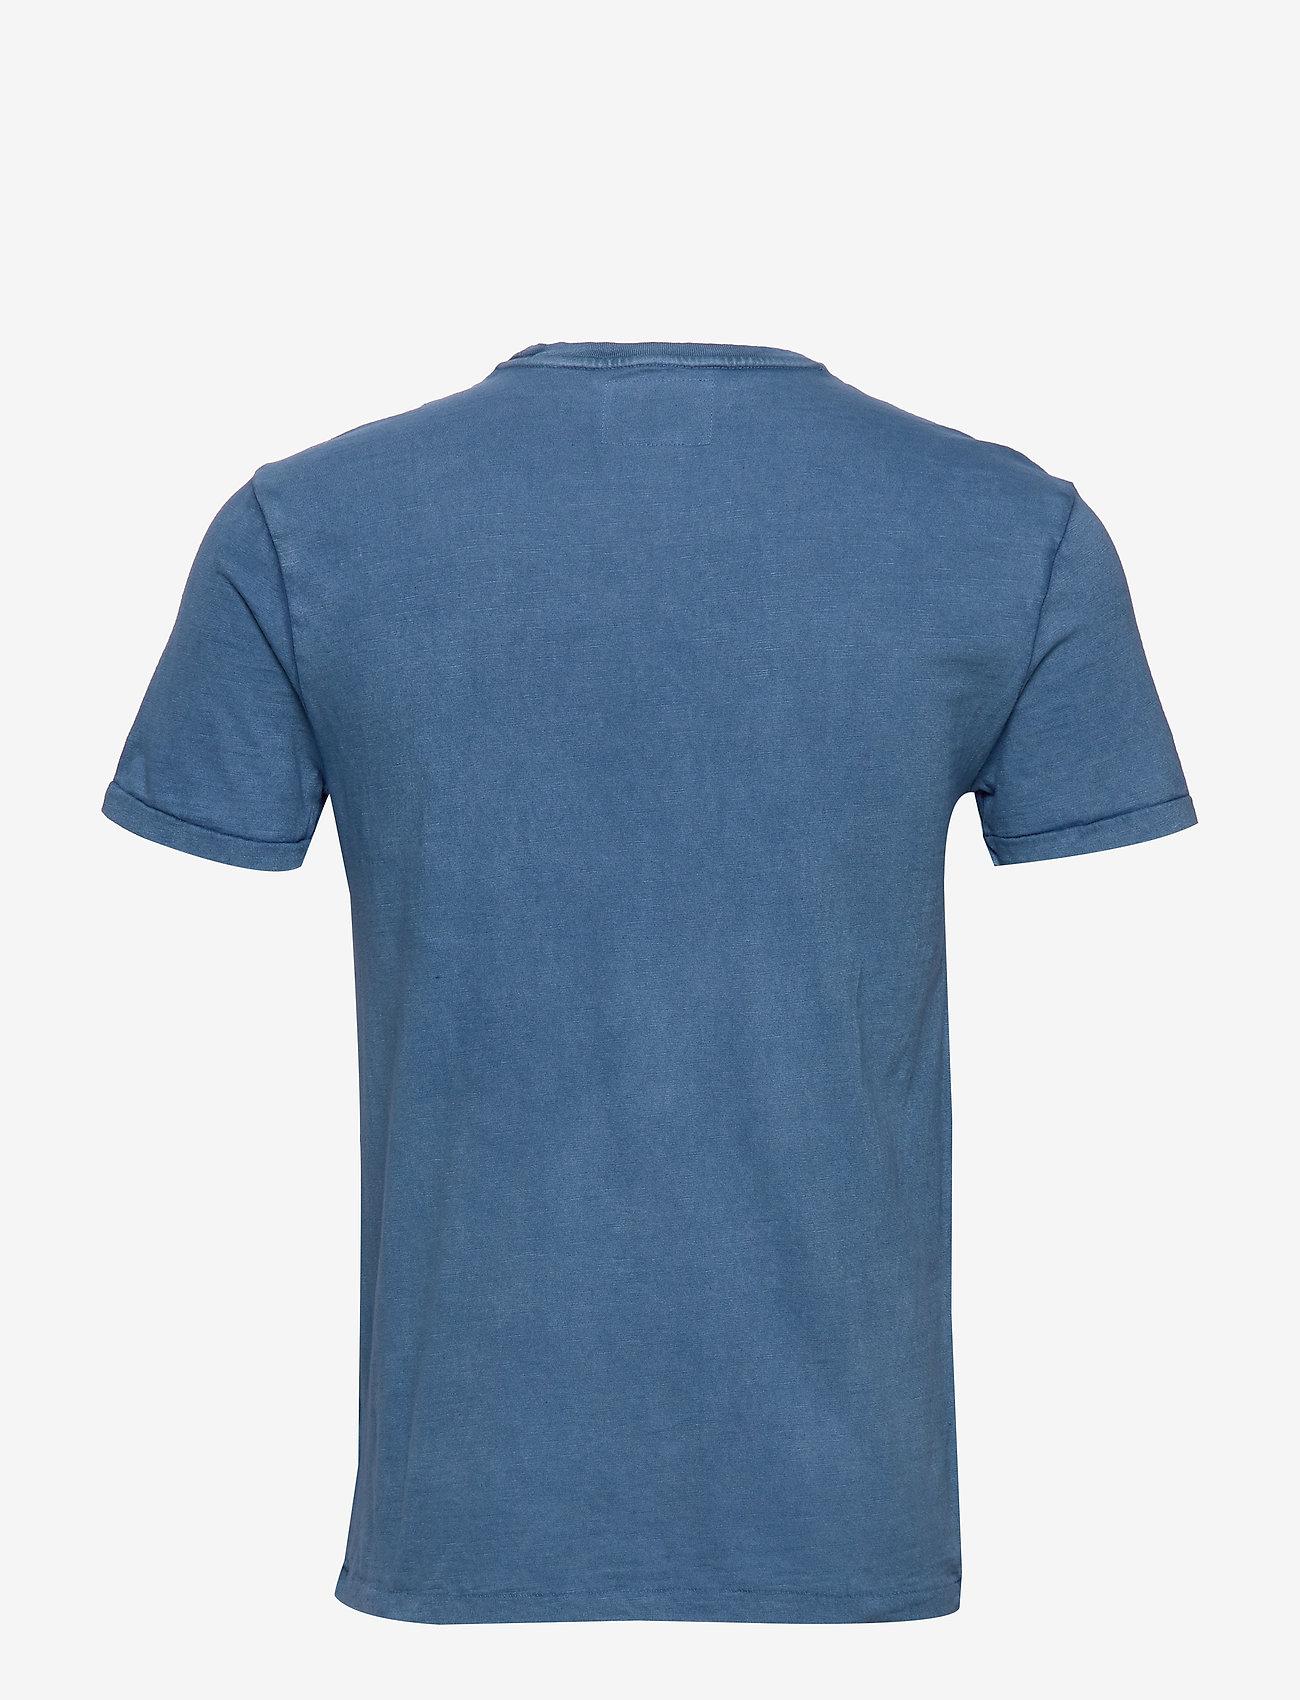 Polo Ralph Lauren Custom Slim Fit Pocket T-shirt - T-shirts